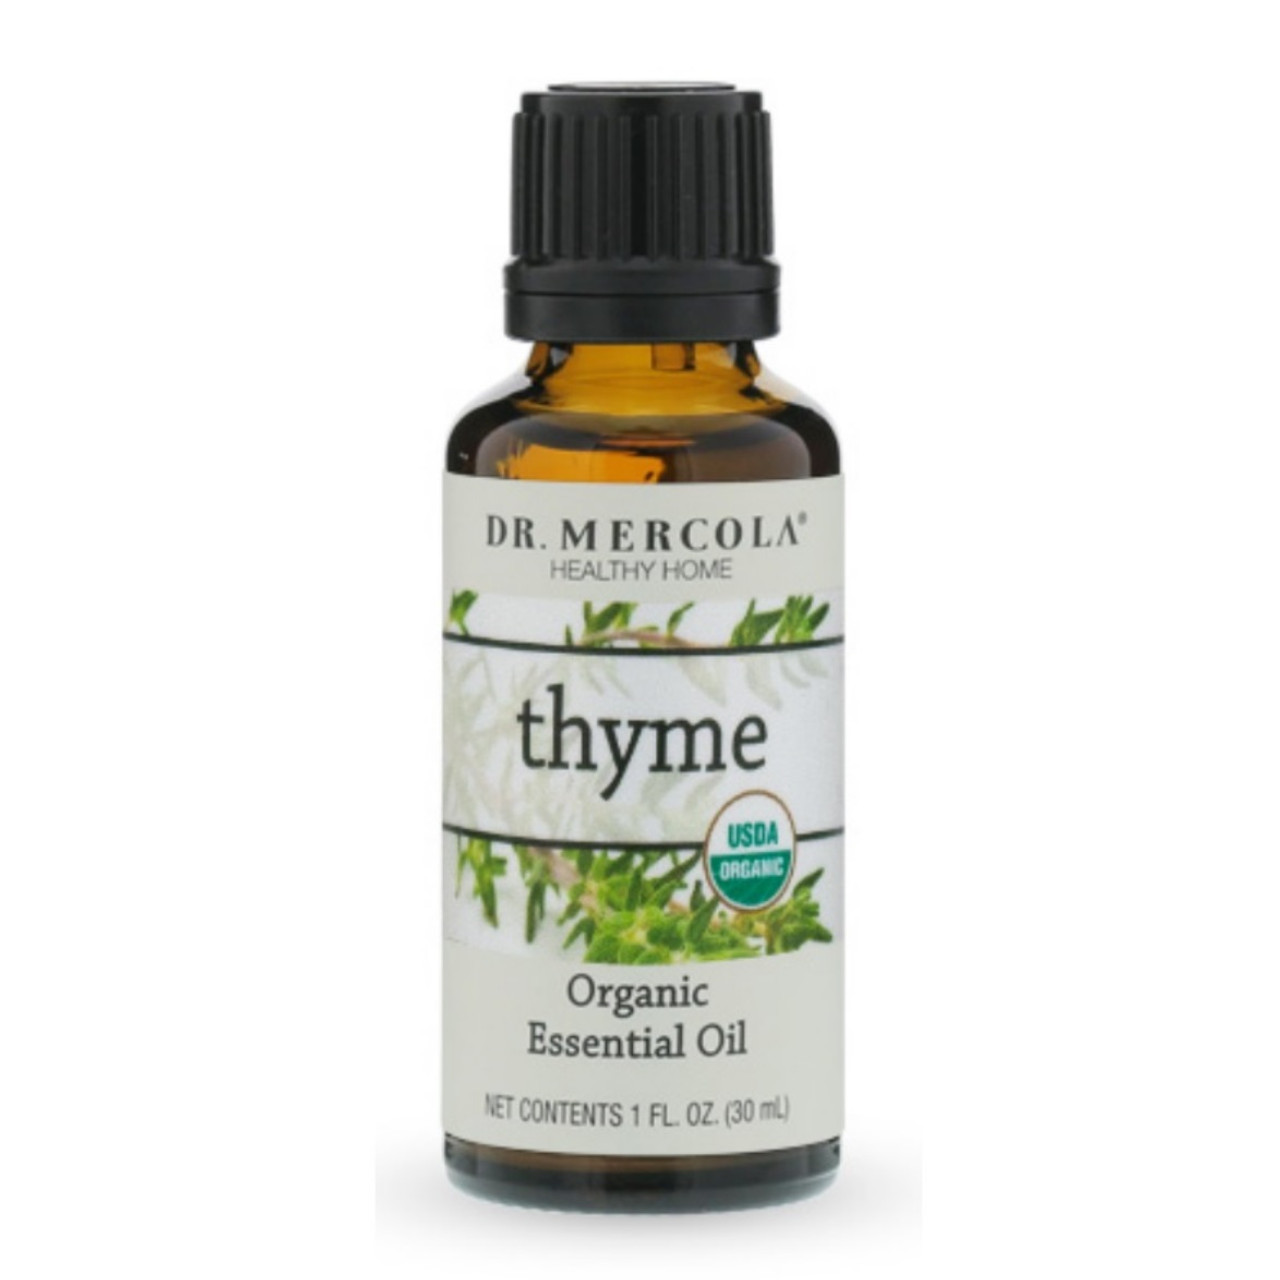 Dr Mercola Organic Thyme Essential Oil